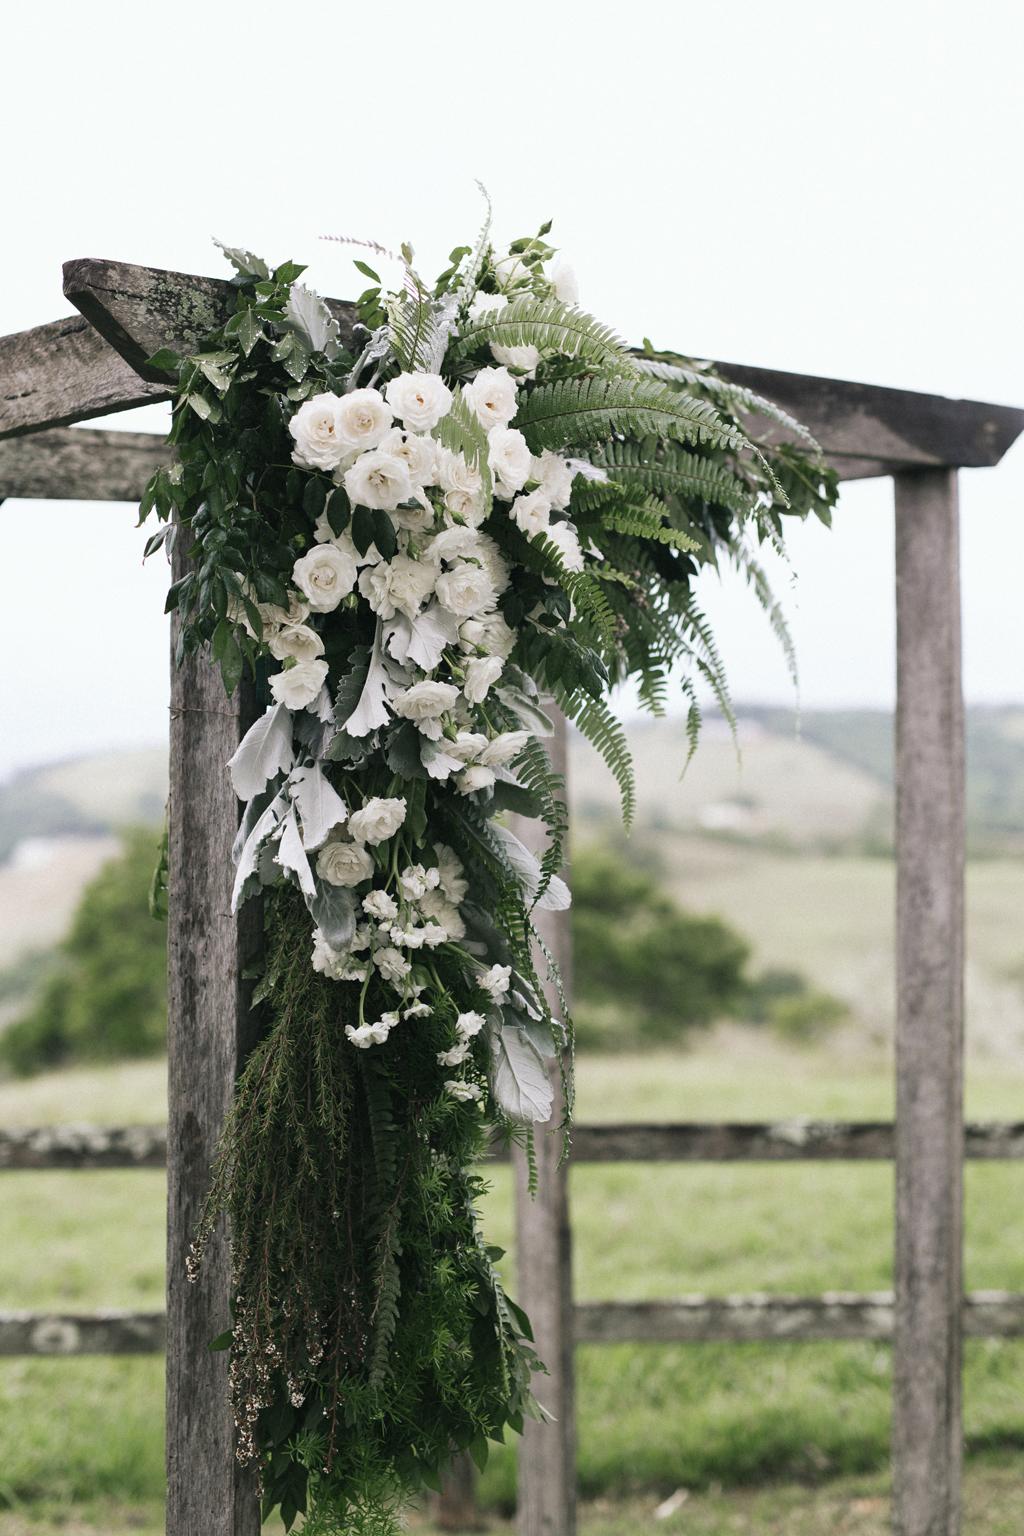 Byron Bay Wedding Photographer - Carly Tia Photography02.jpg